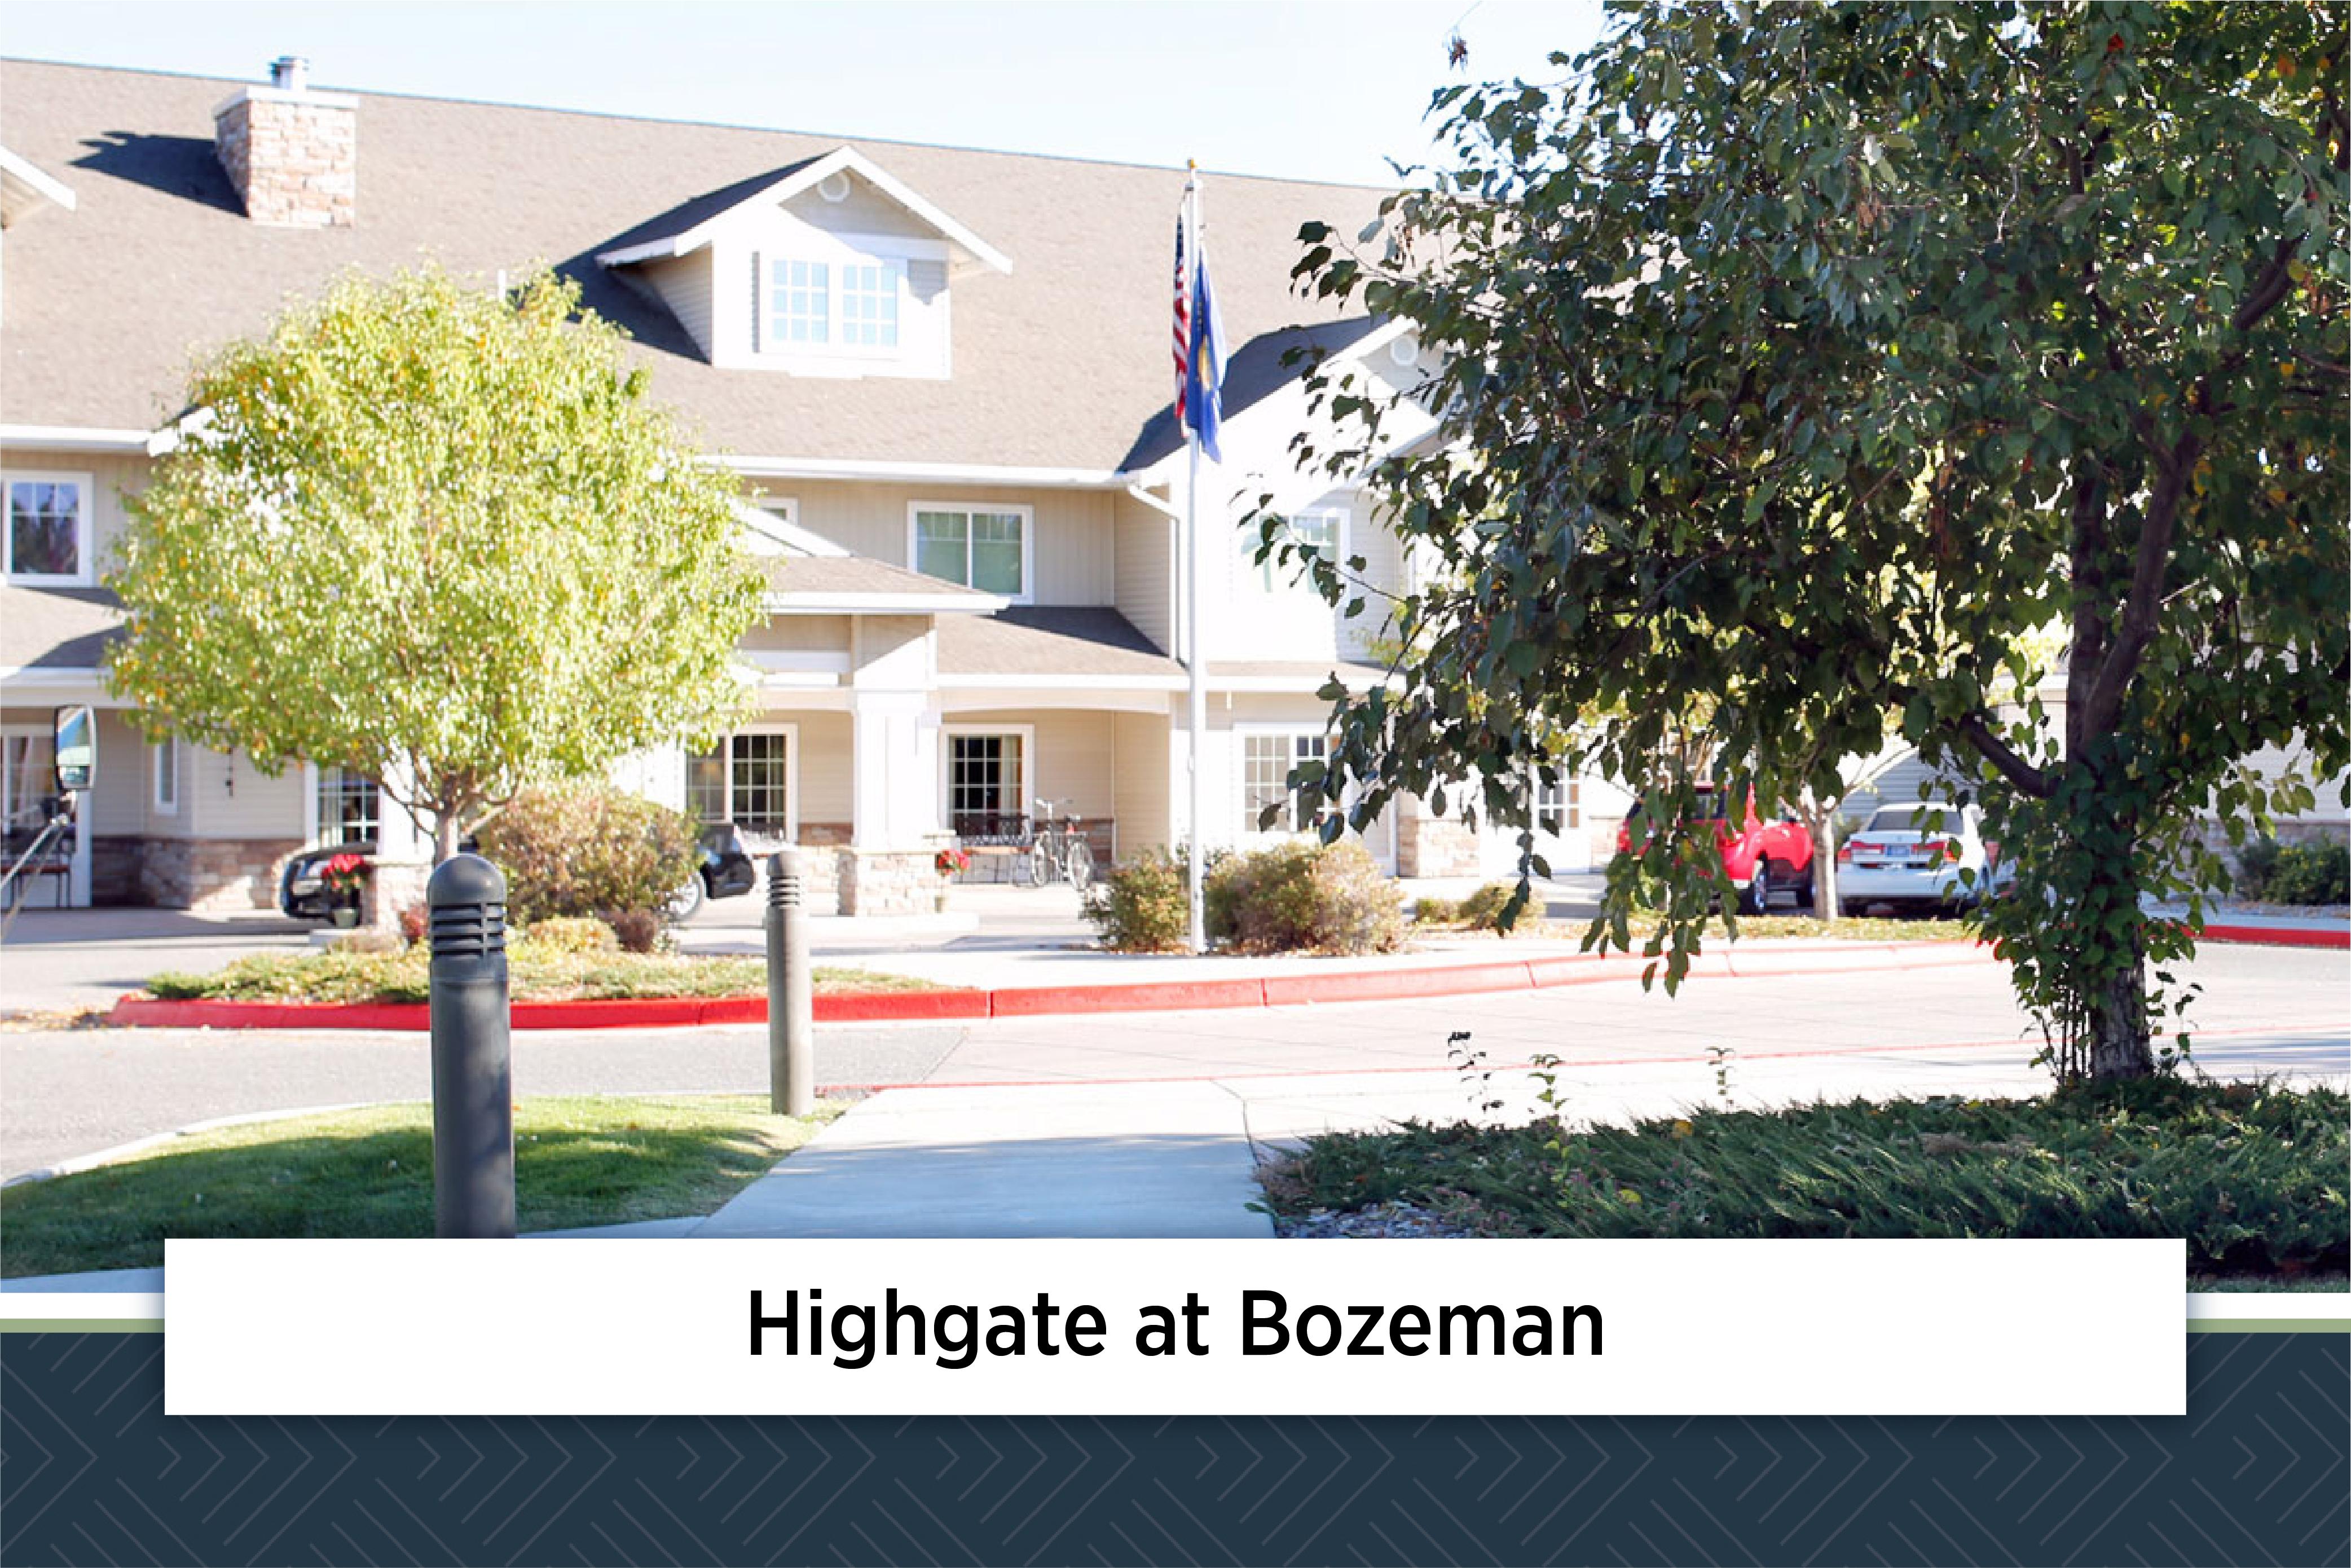 Highgate at Bozeman